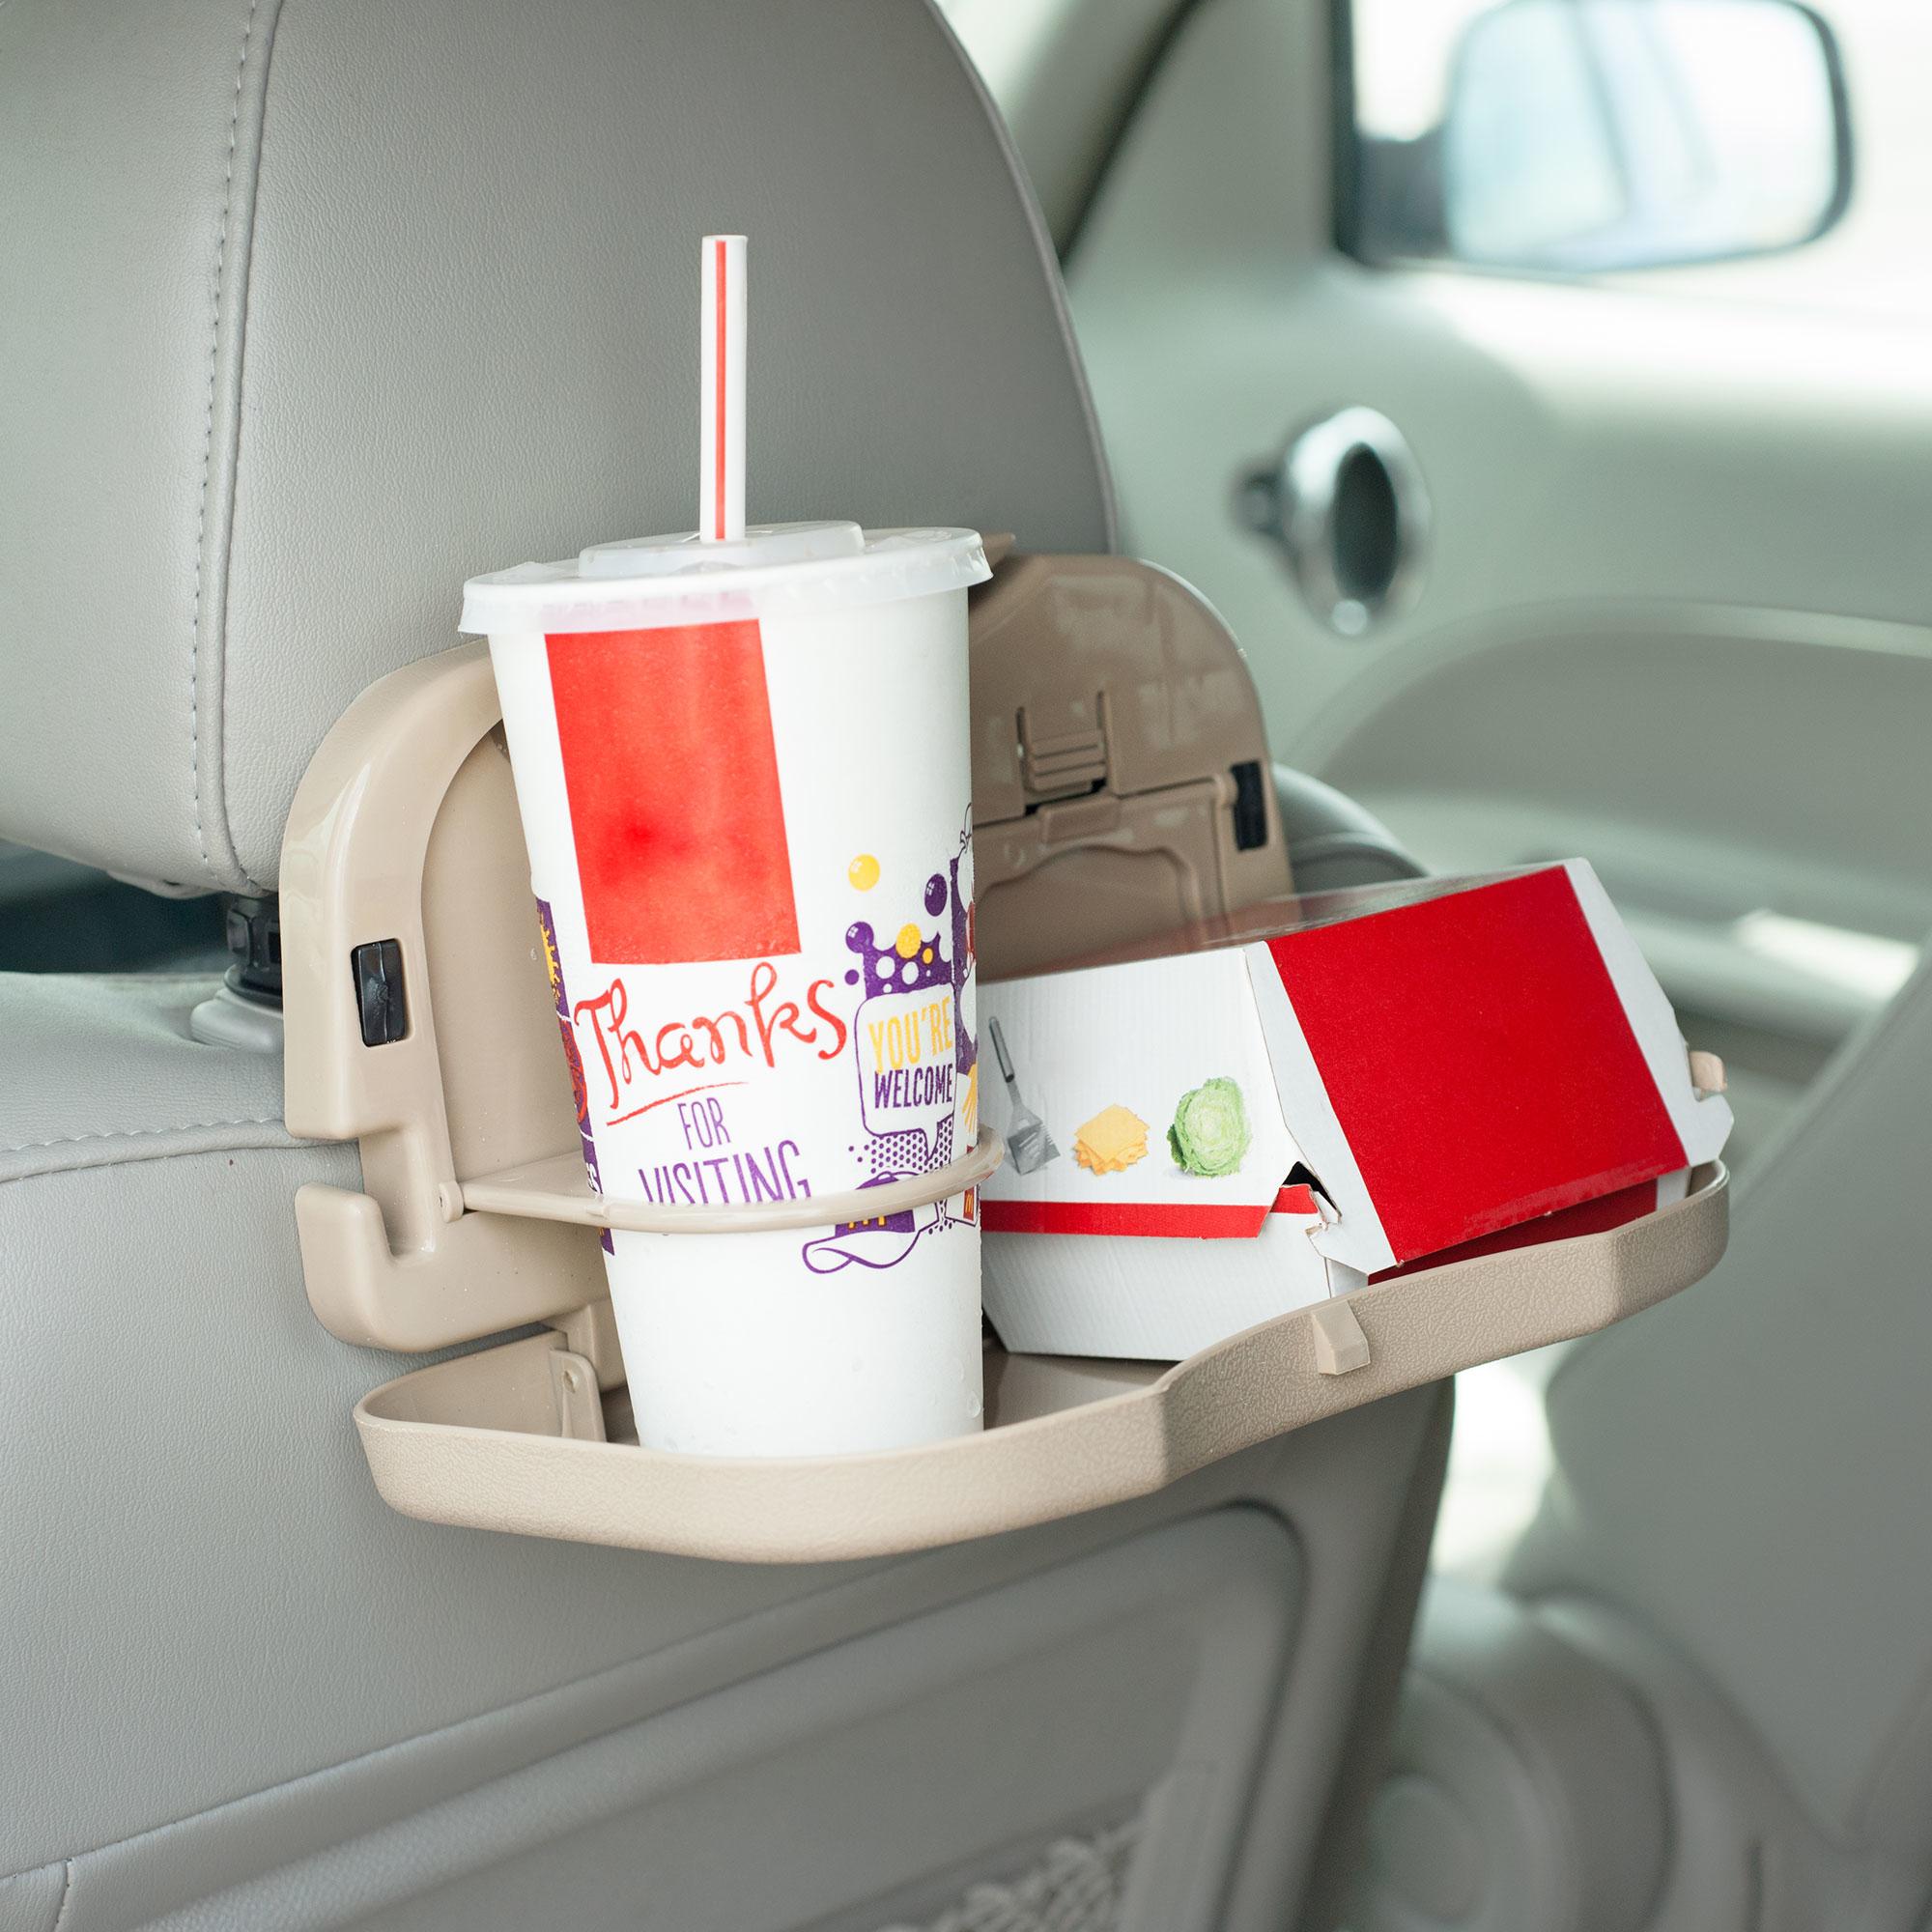 Trademark Mobile Backseat Folding Dinner Tray 582e0f14e2246145795dcc17